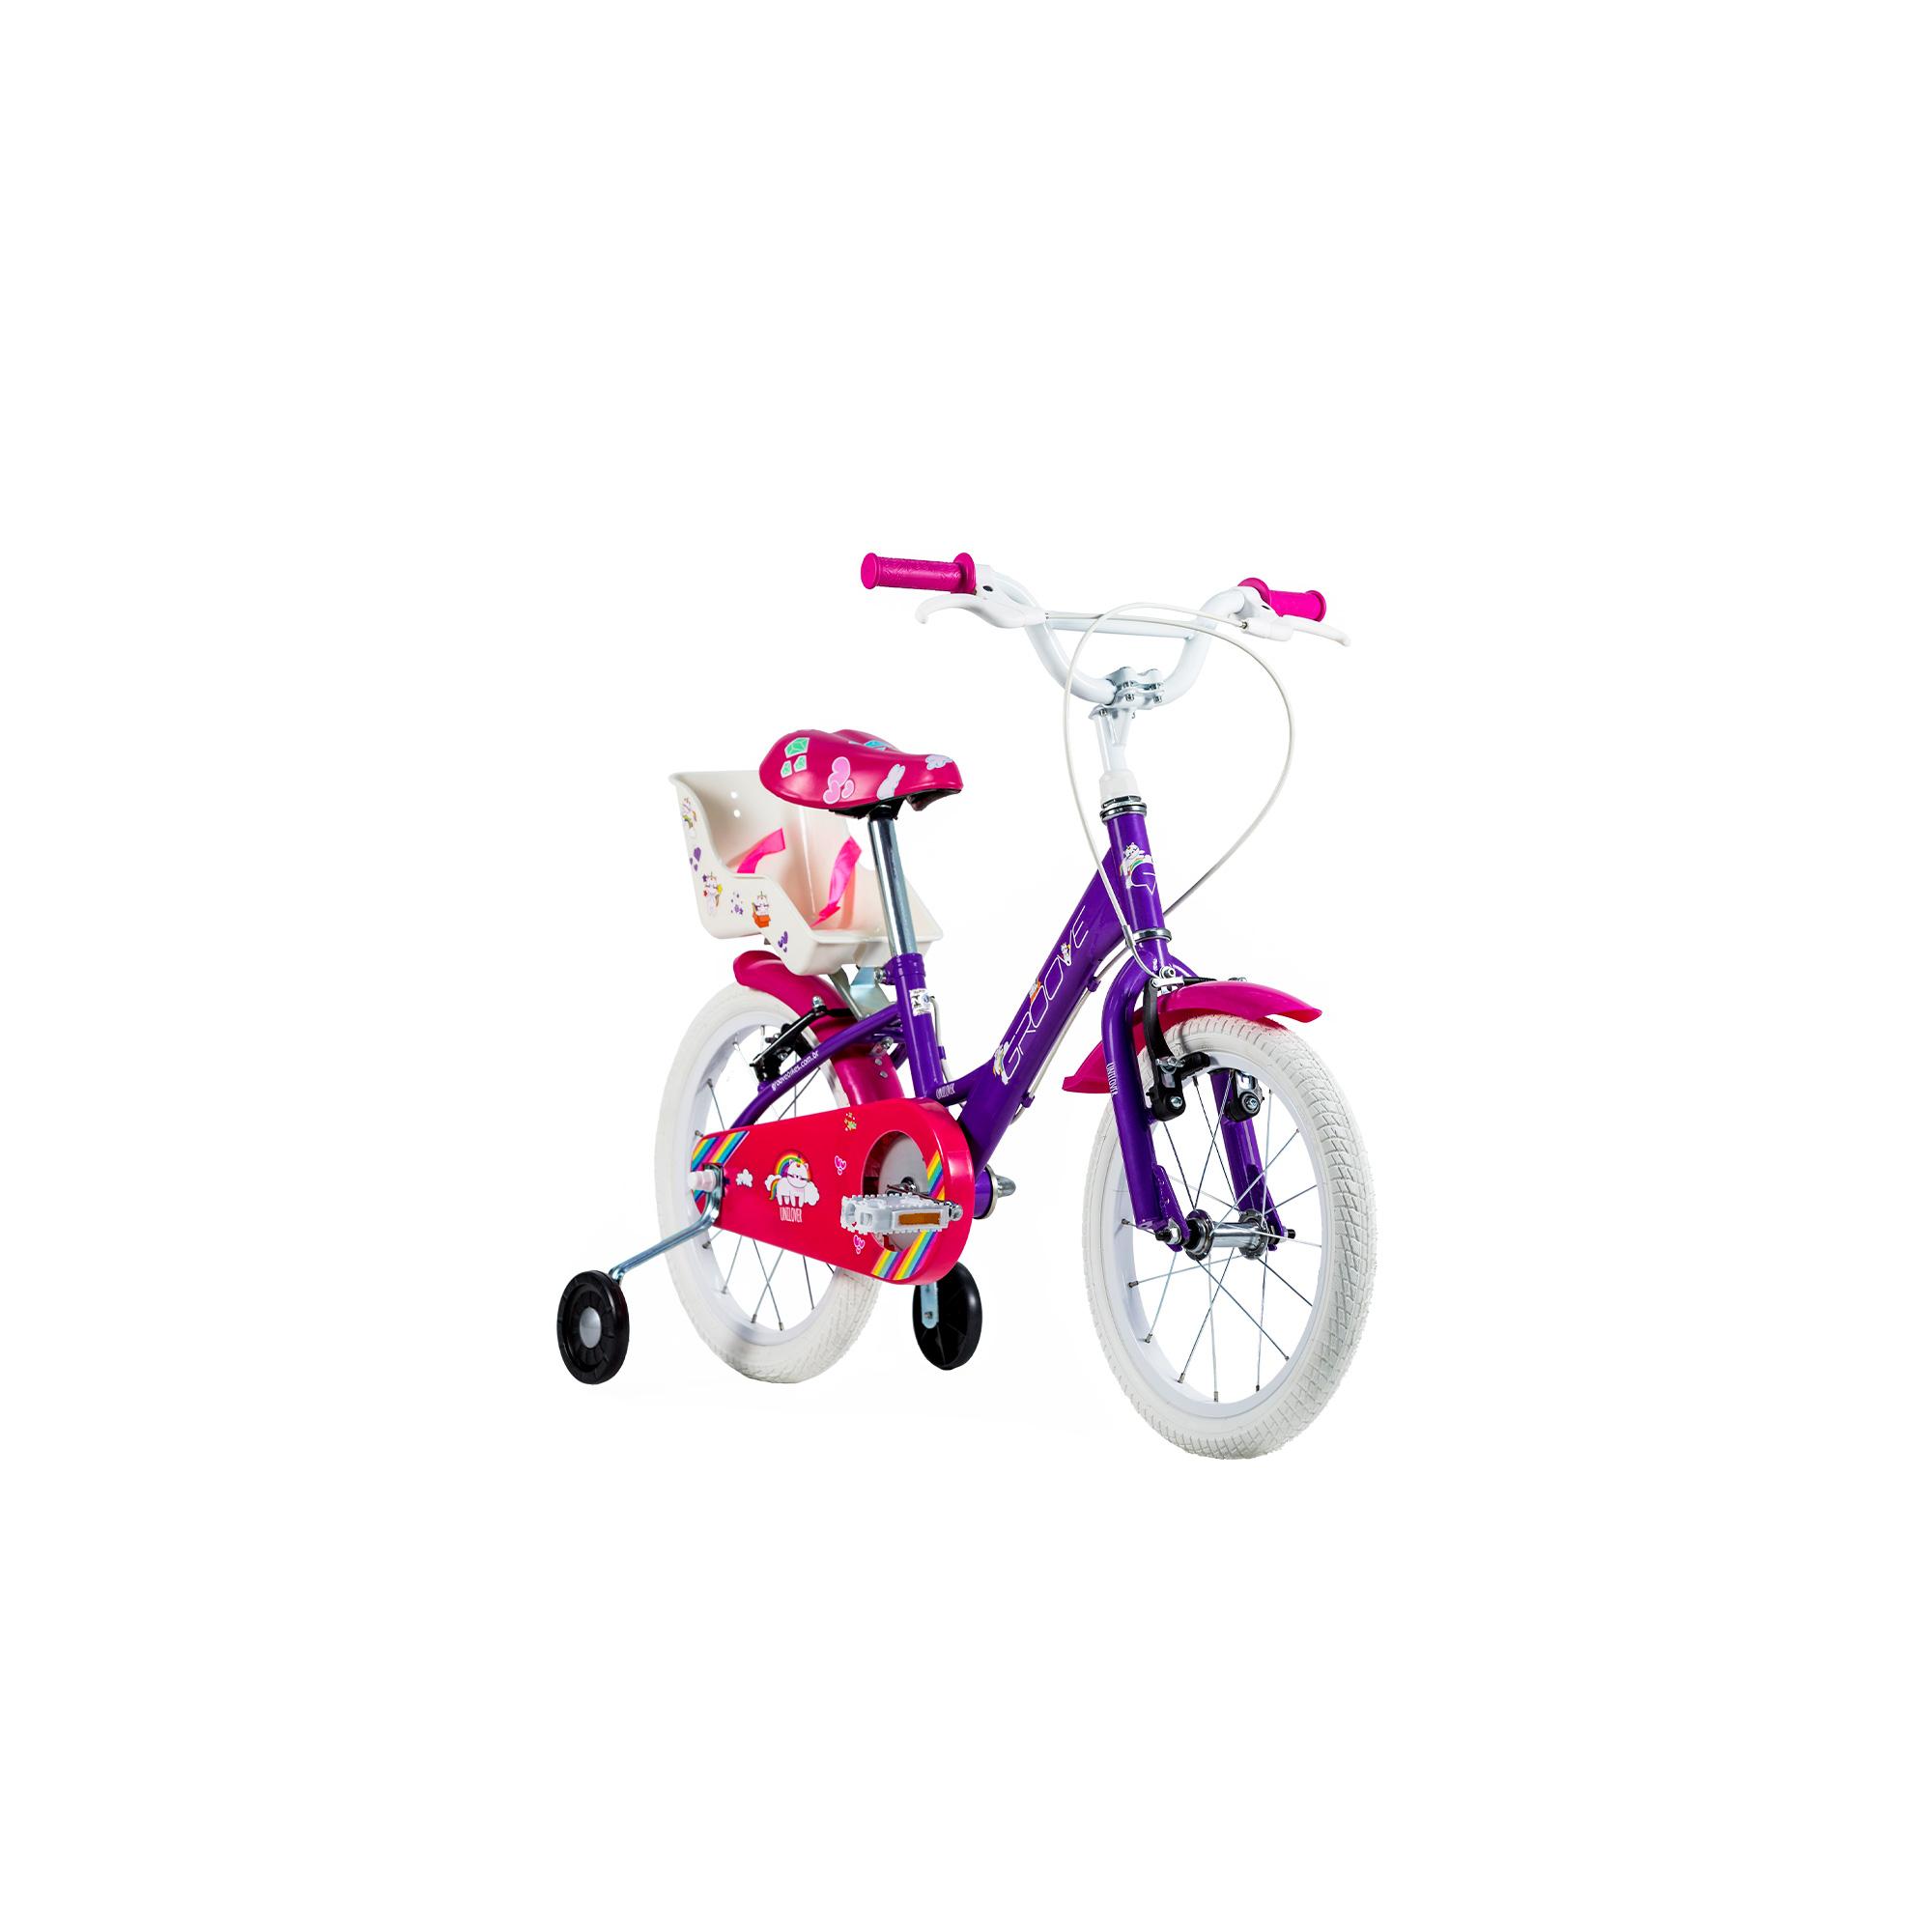 Foto-Bicicleta-Groove-Unilover-16-Capa